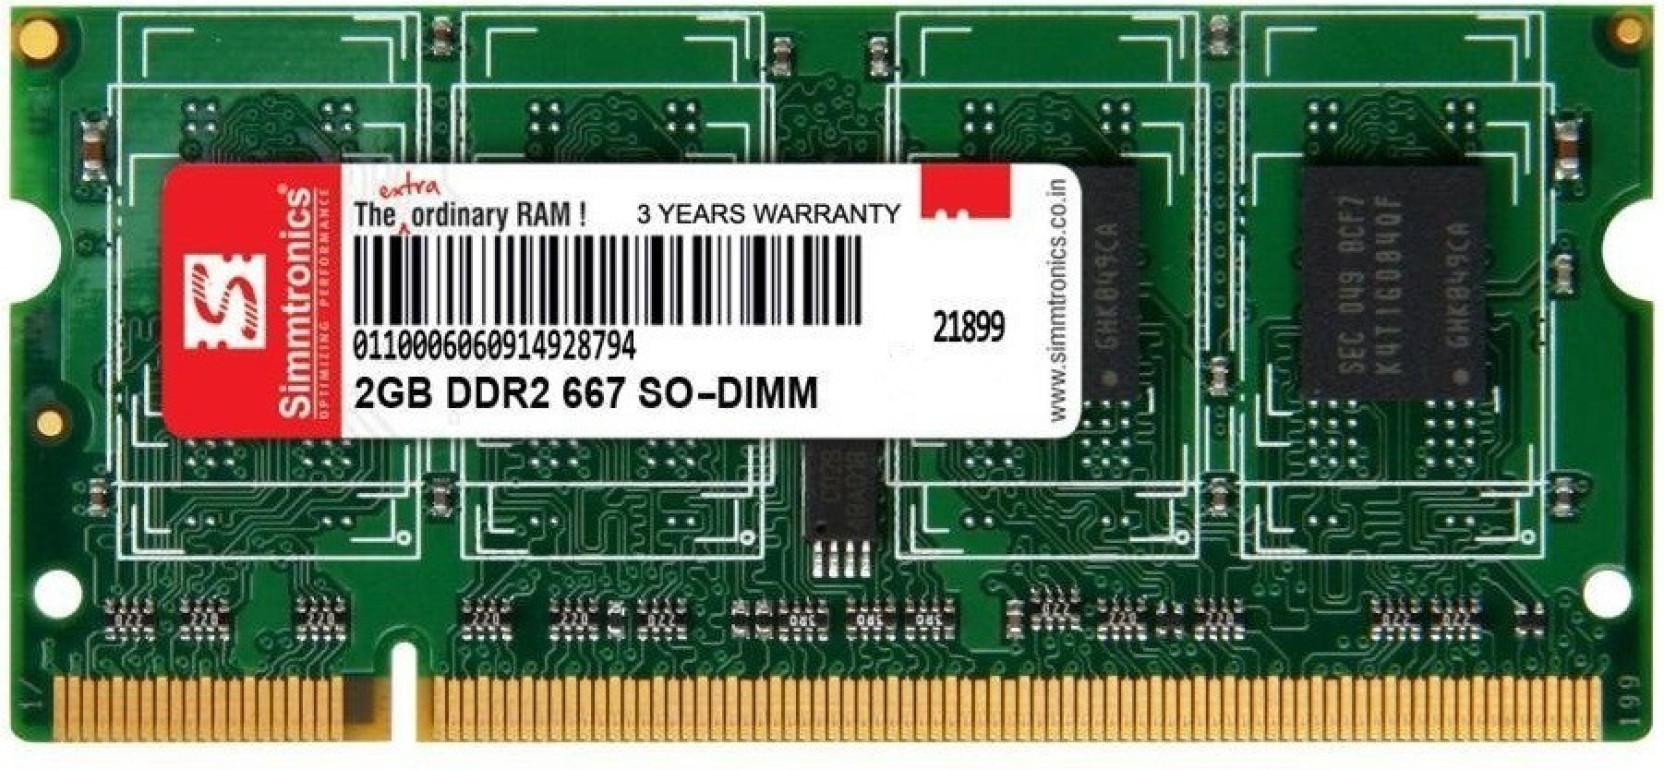 Simtronics 667 5300 Ddr2 2 Gb Single Channel Laptop Simmtronics Ram Sodimm 2gb Pc6400 Add To Cart